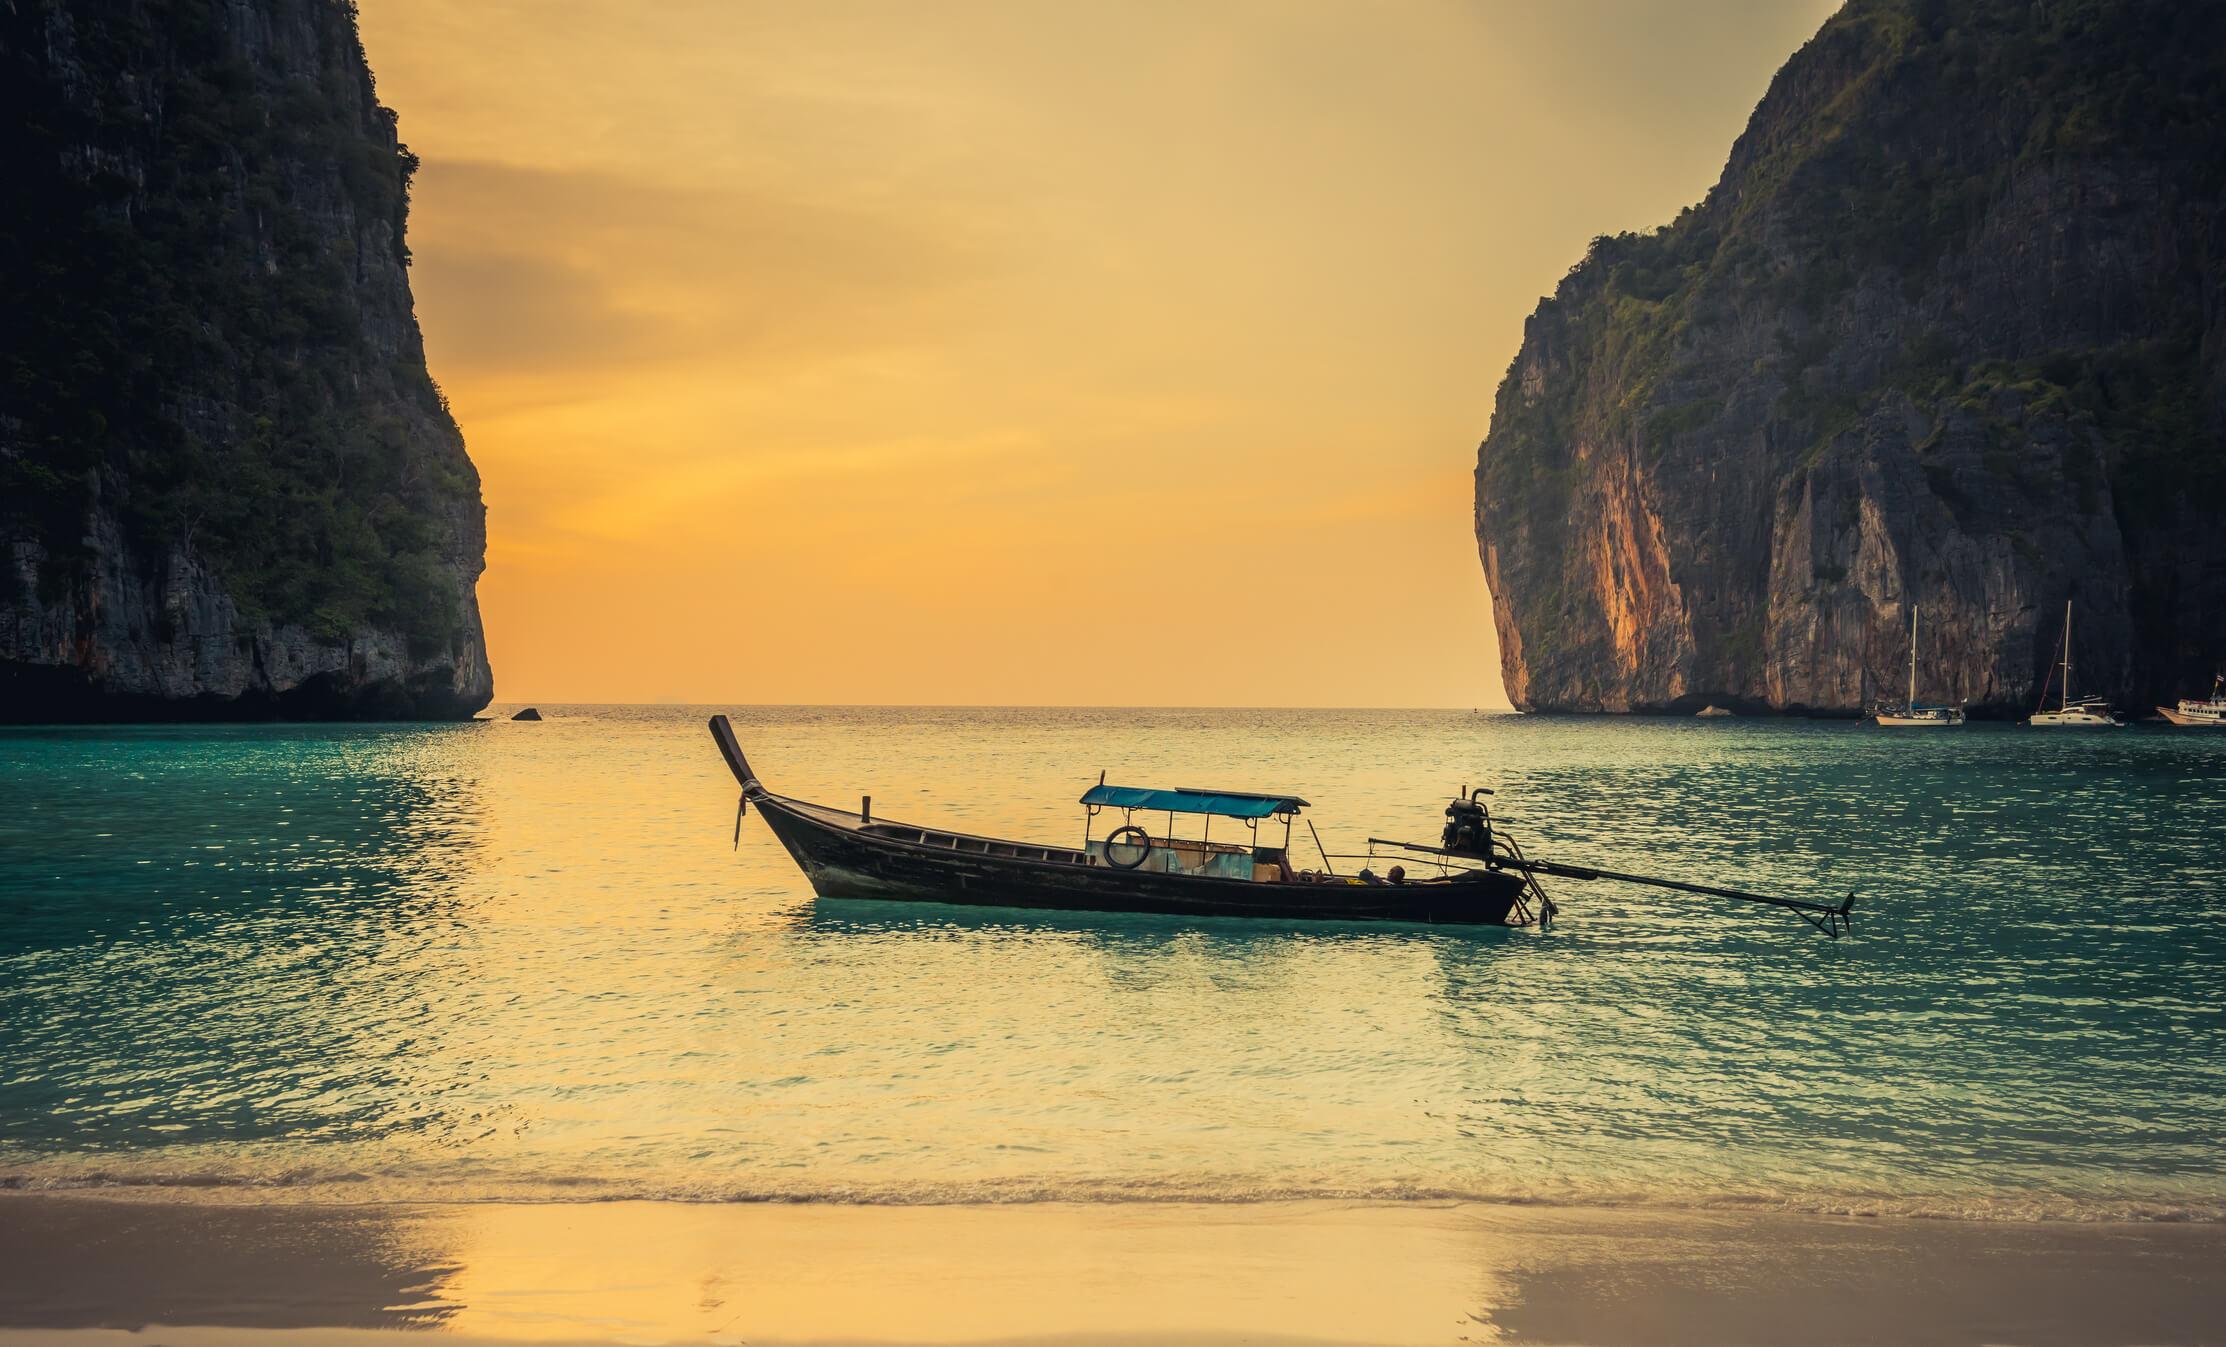 Sunset at Maya Bay - places to see in Krabi